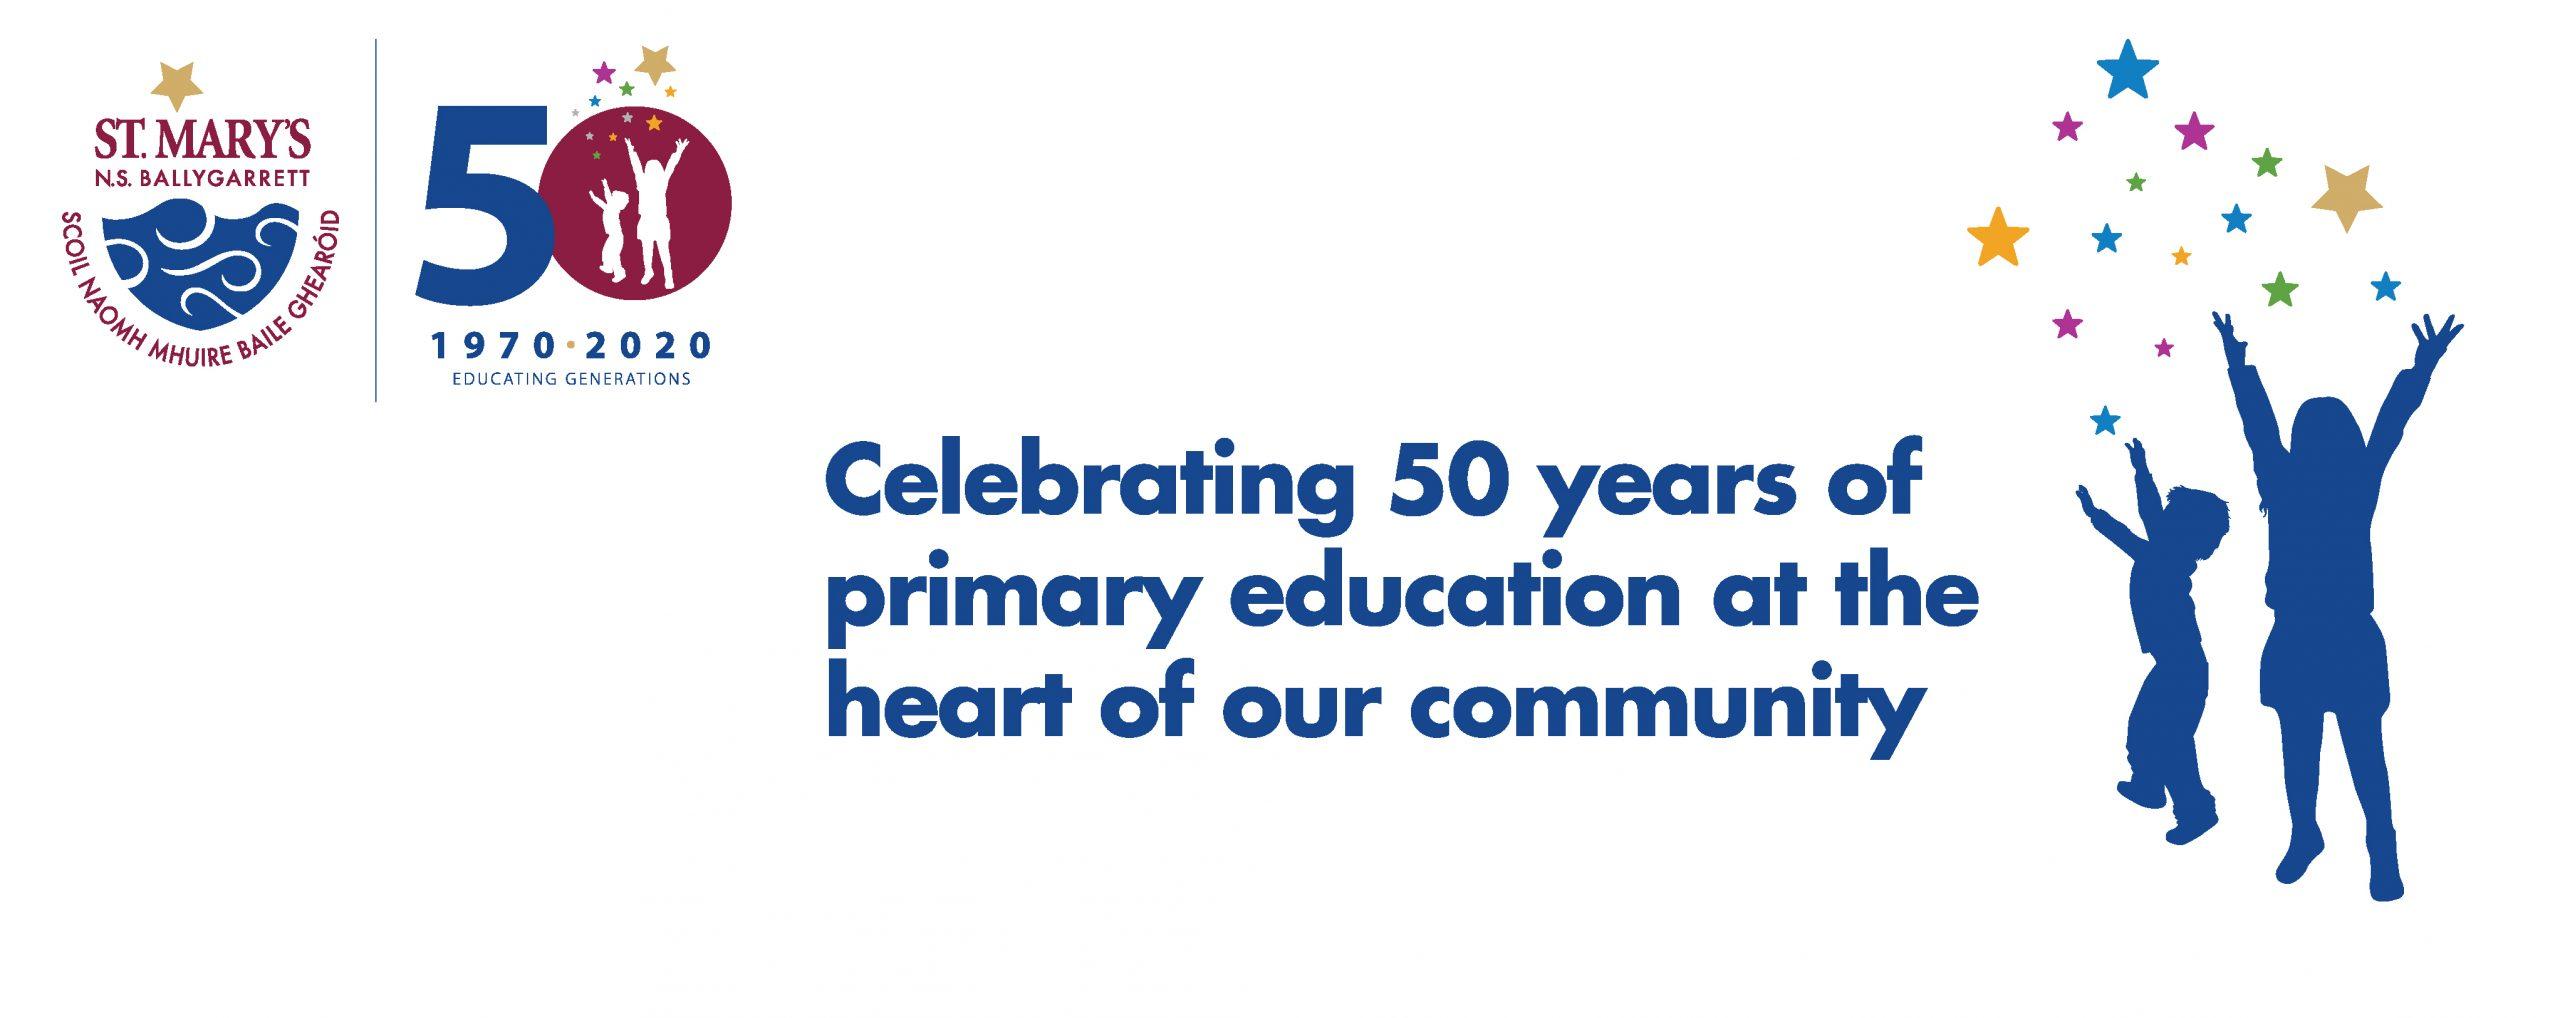 Jubilee 1970 2020 | St. Mary'S Ns Ballygarrett Regarding William And Mary School Calendar 2021 2020